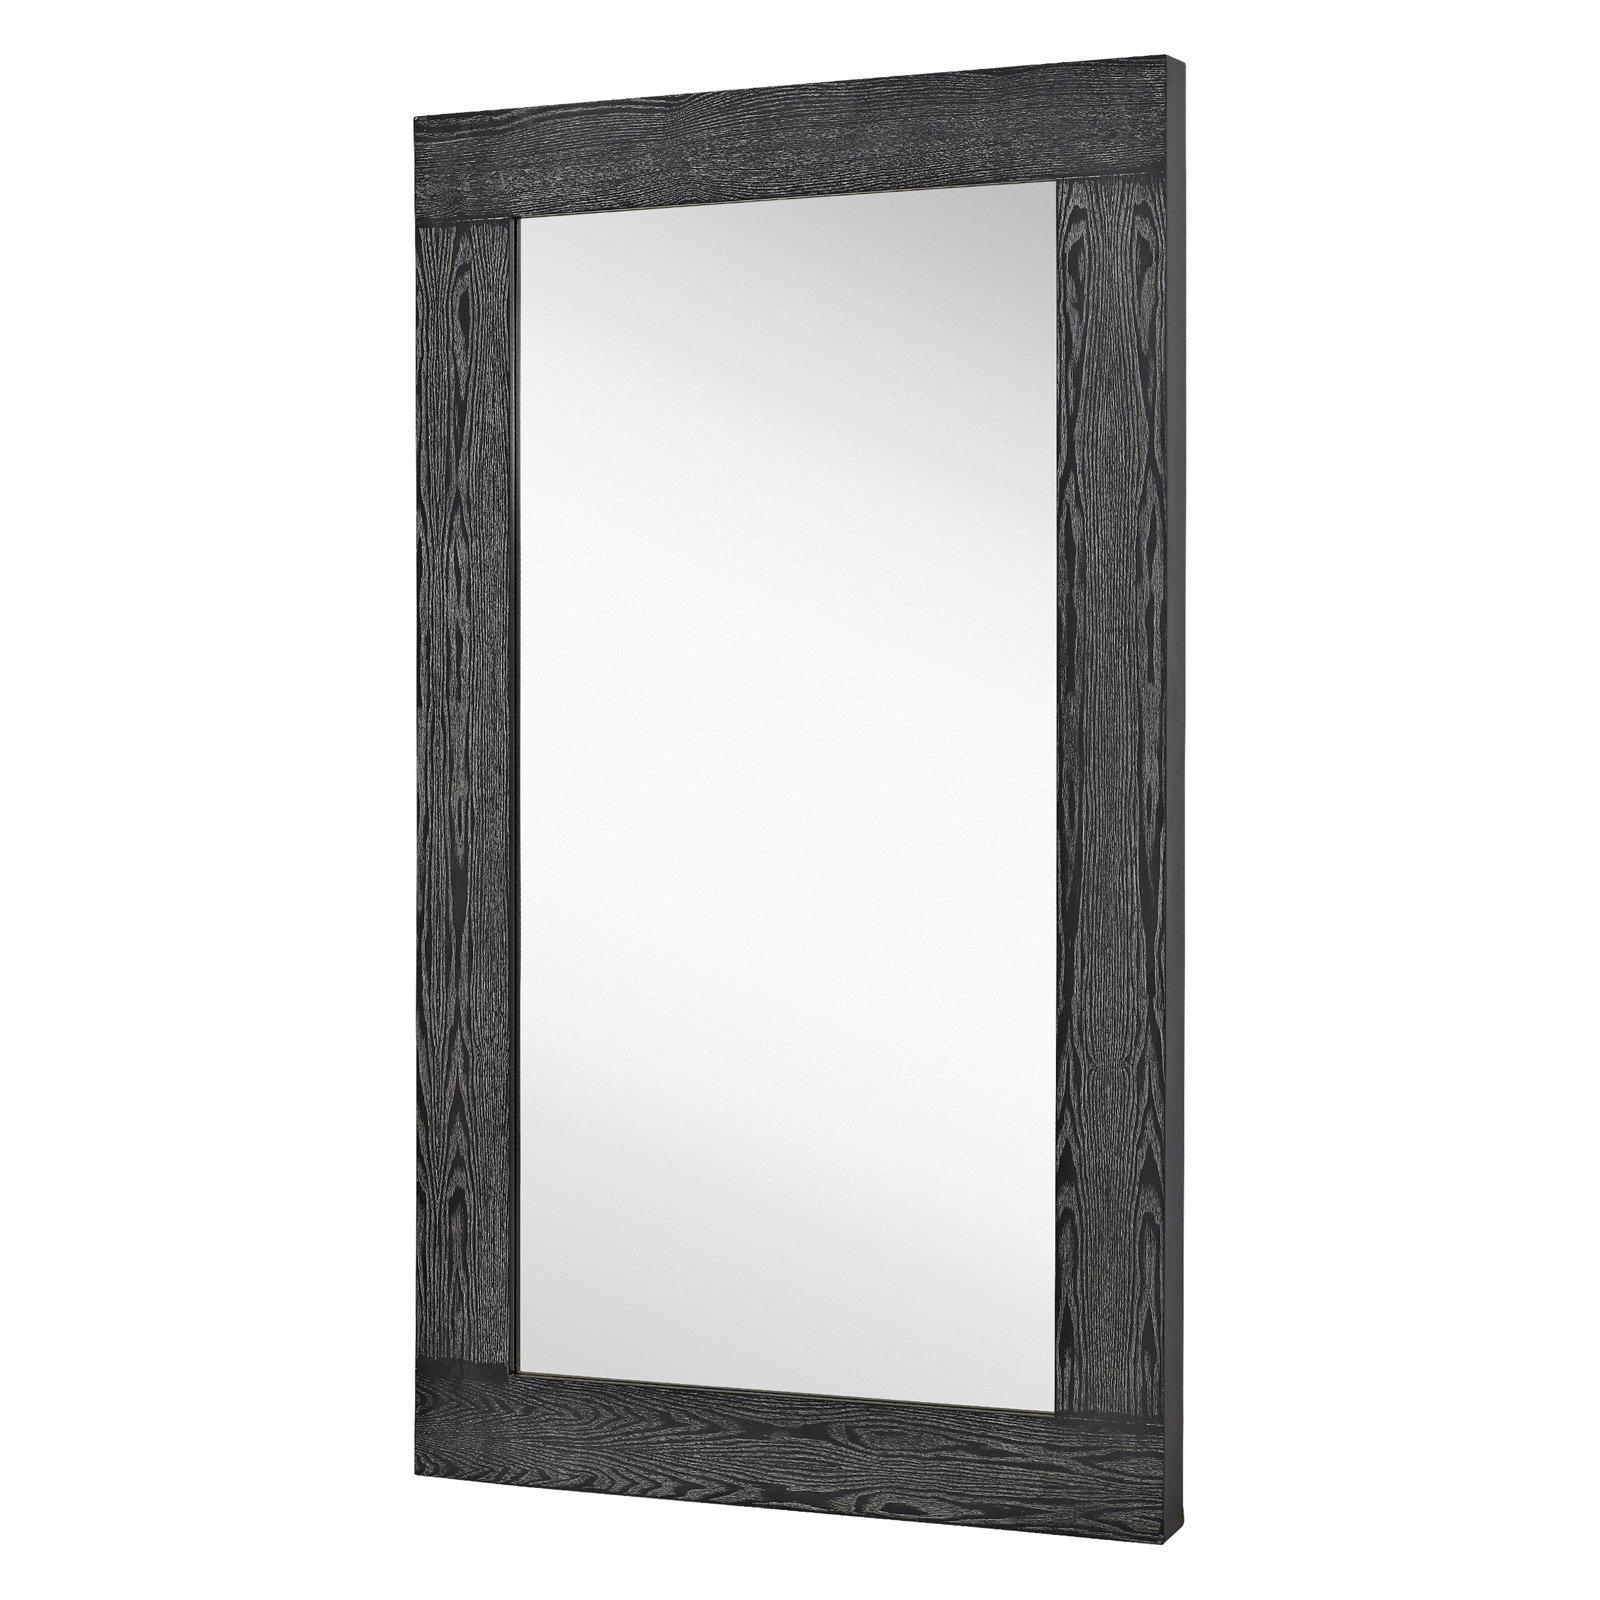 Majestic Oversized Modern Rectangular Wall Mirror Panel (View 5 of 20)